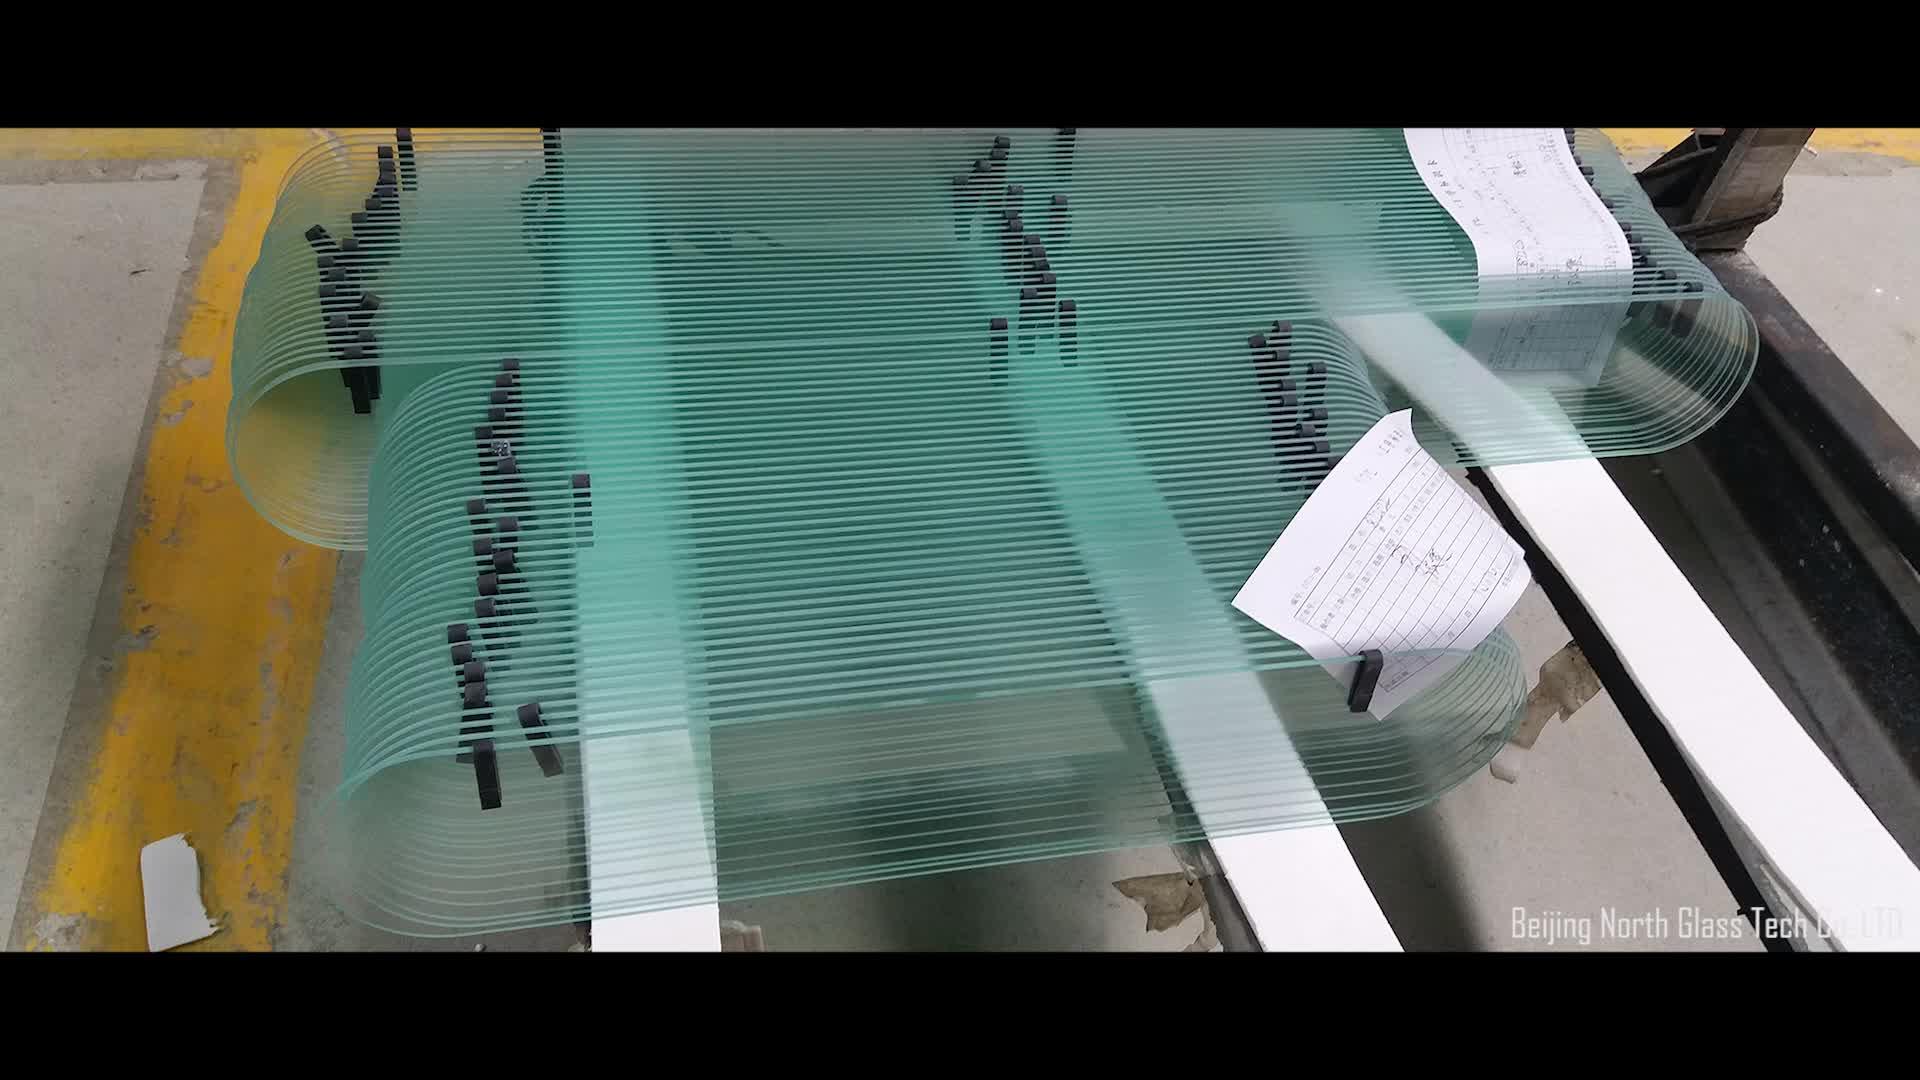 10mm หนาขัด clear tempered รอบ toughened glass สำหรับตารางด้านบน